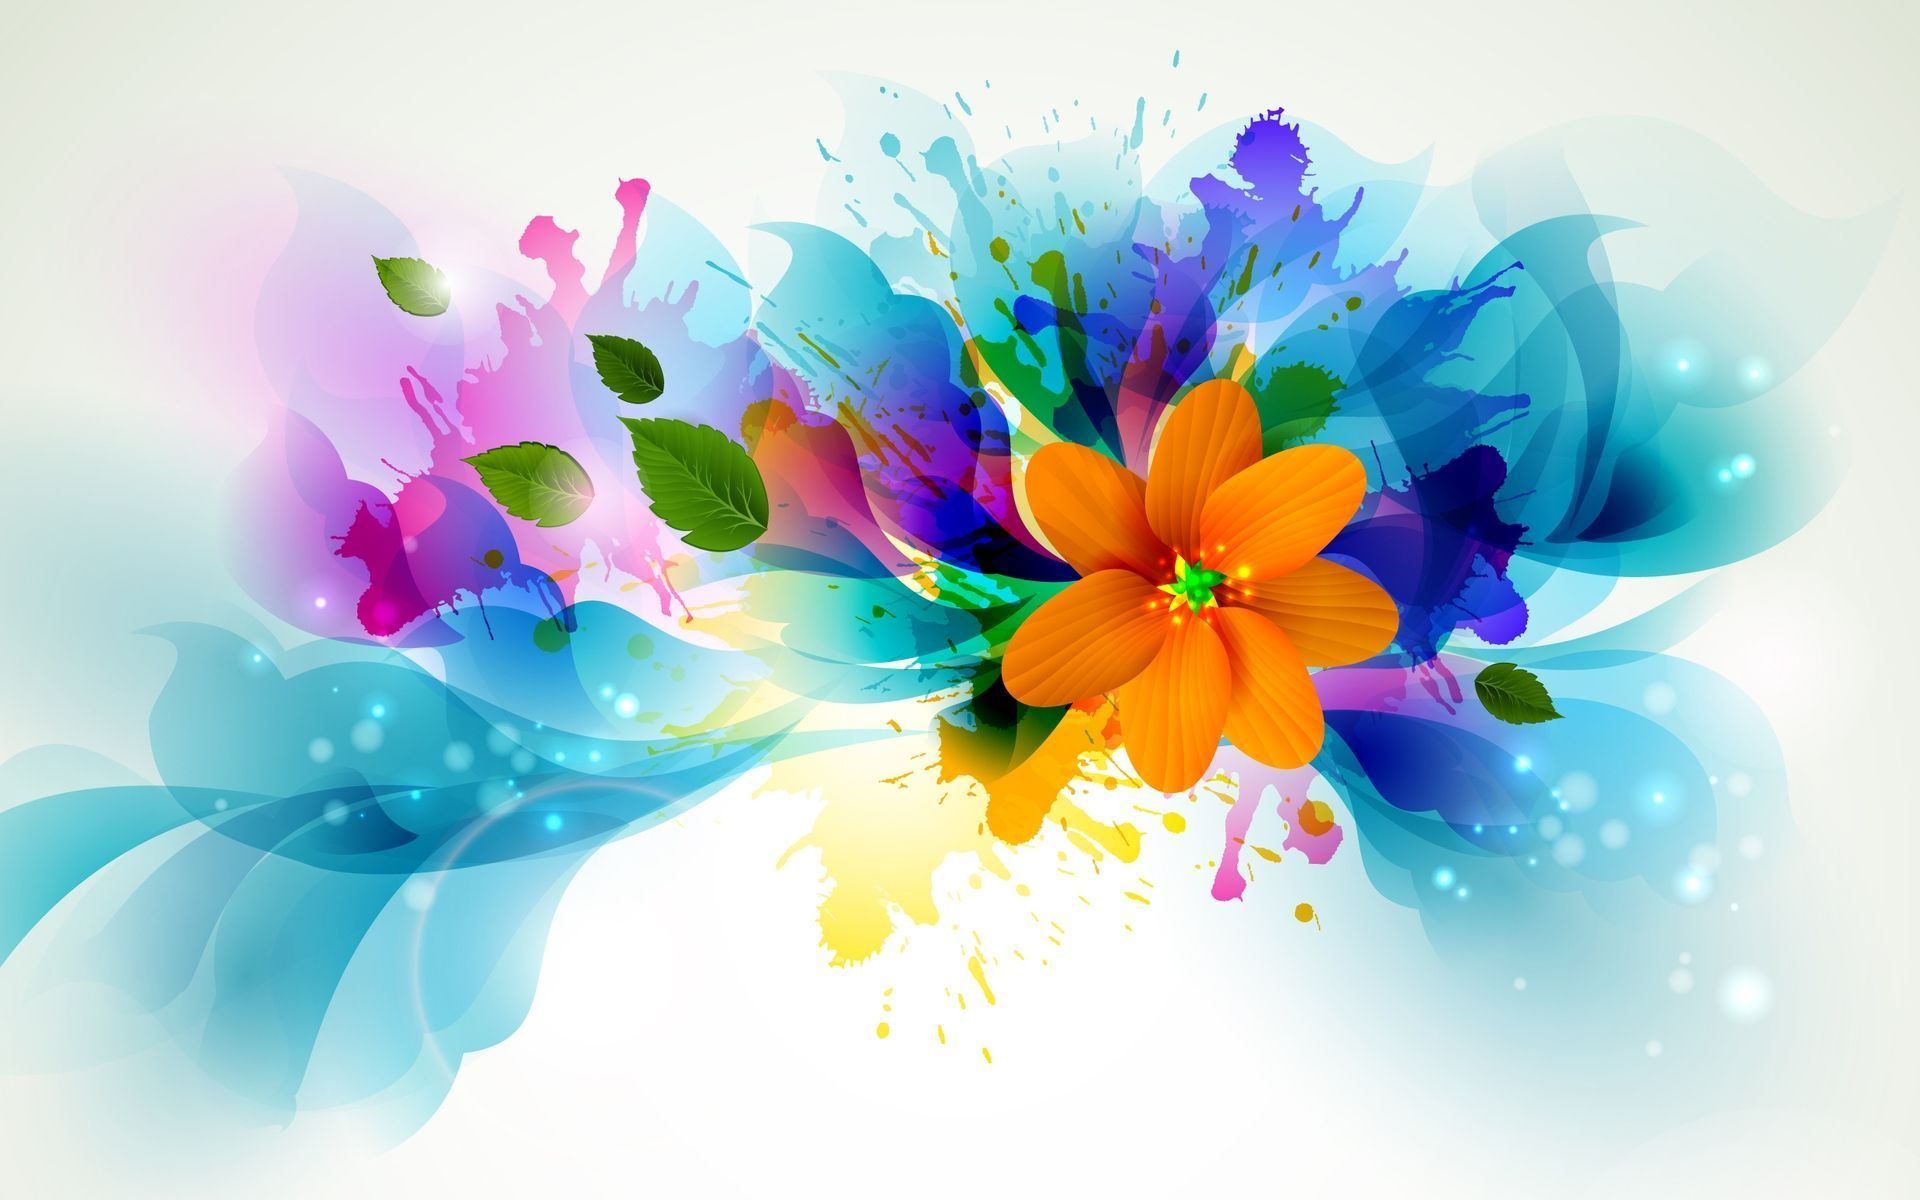 Bright wallpaper wallpaper free download 1920×1200 Bright